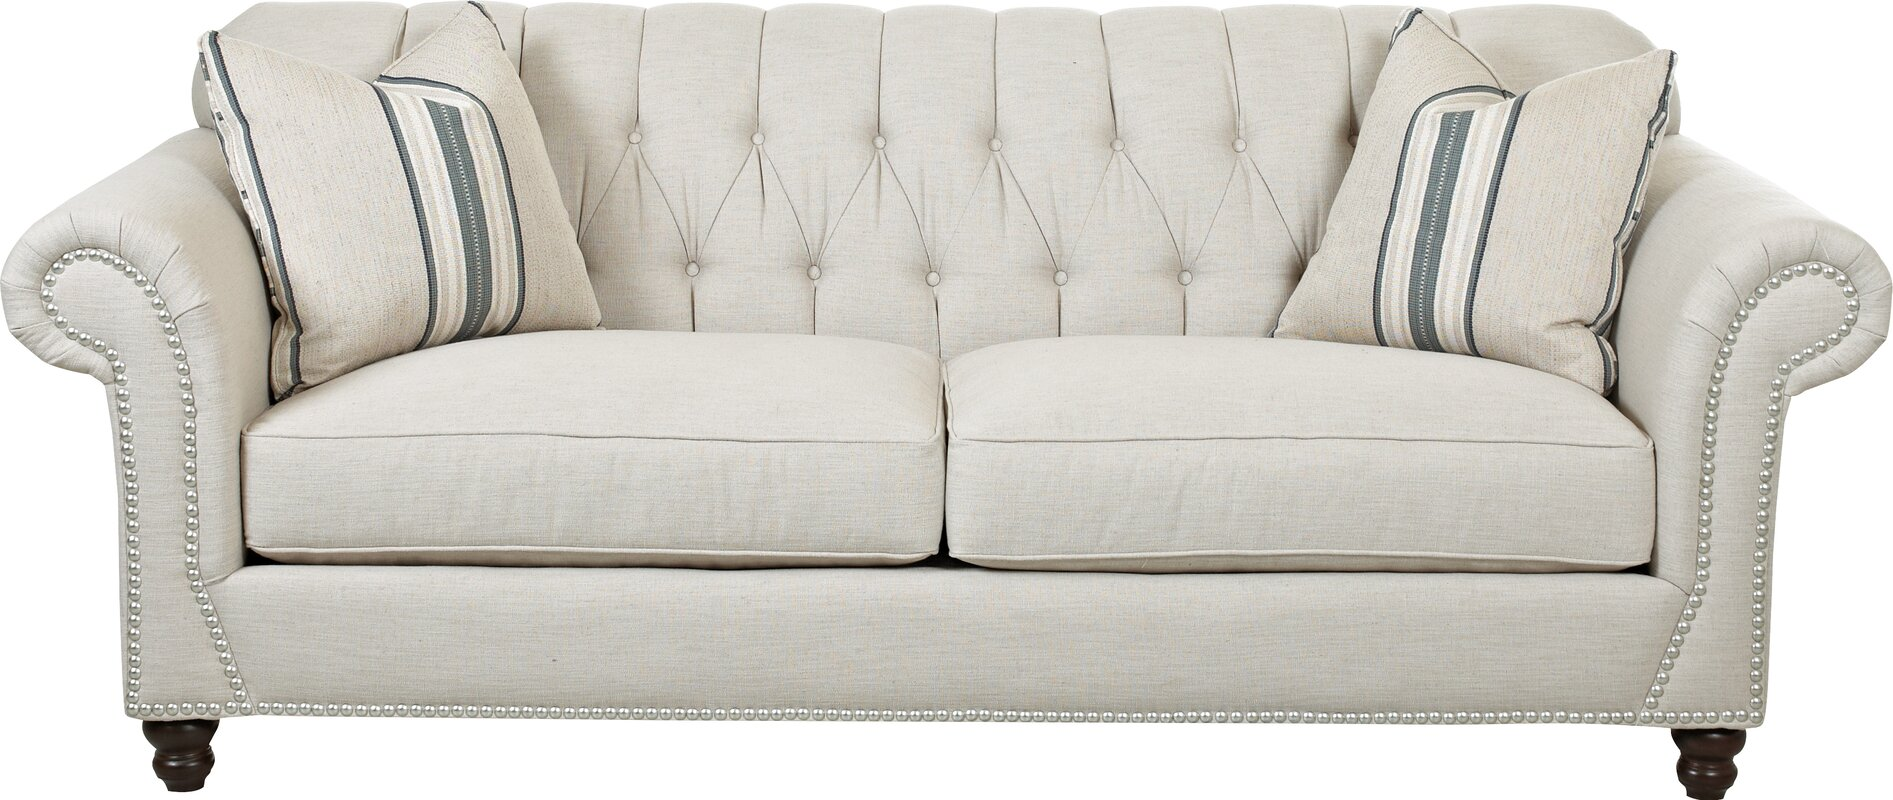 annie sofa reviews joss main. Black Bedroom Furniture Sets. Home Design Ideas